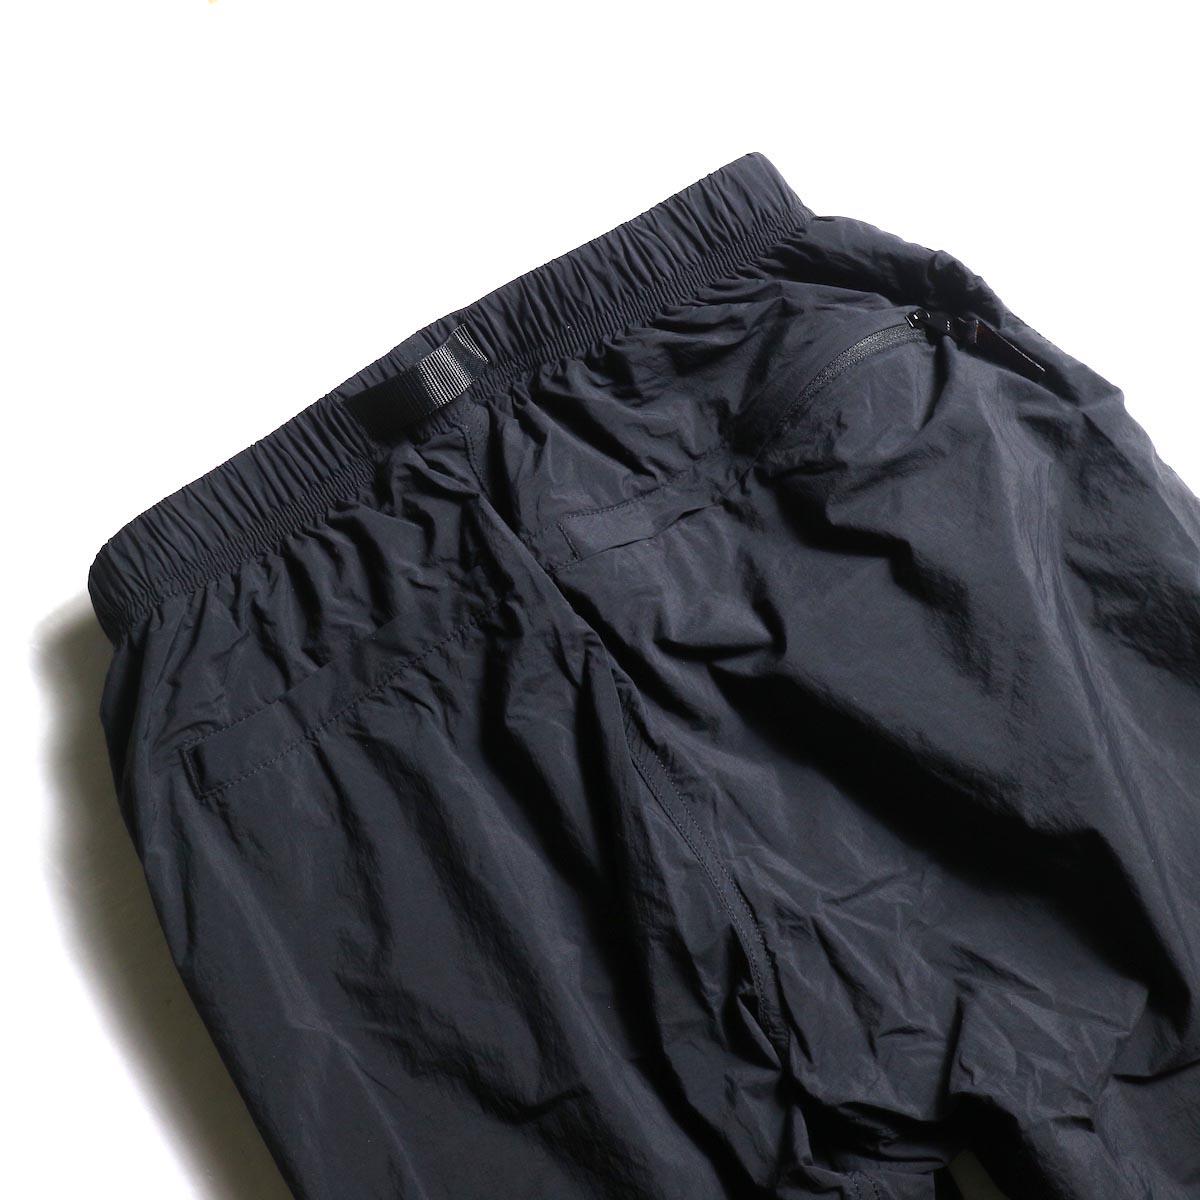 GRAMICCI / Packable Truck Pants (Black) ヒップポケット